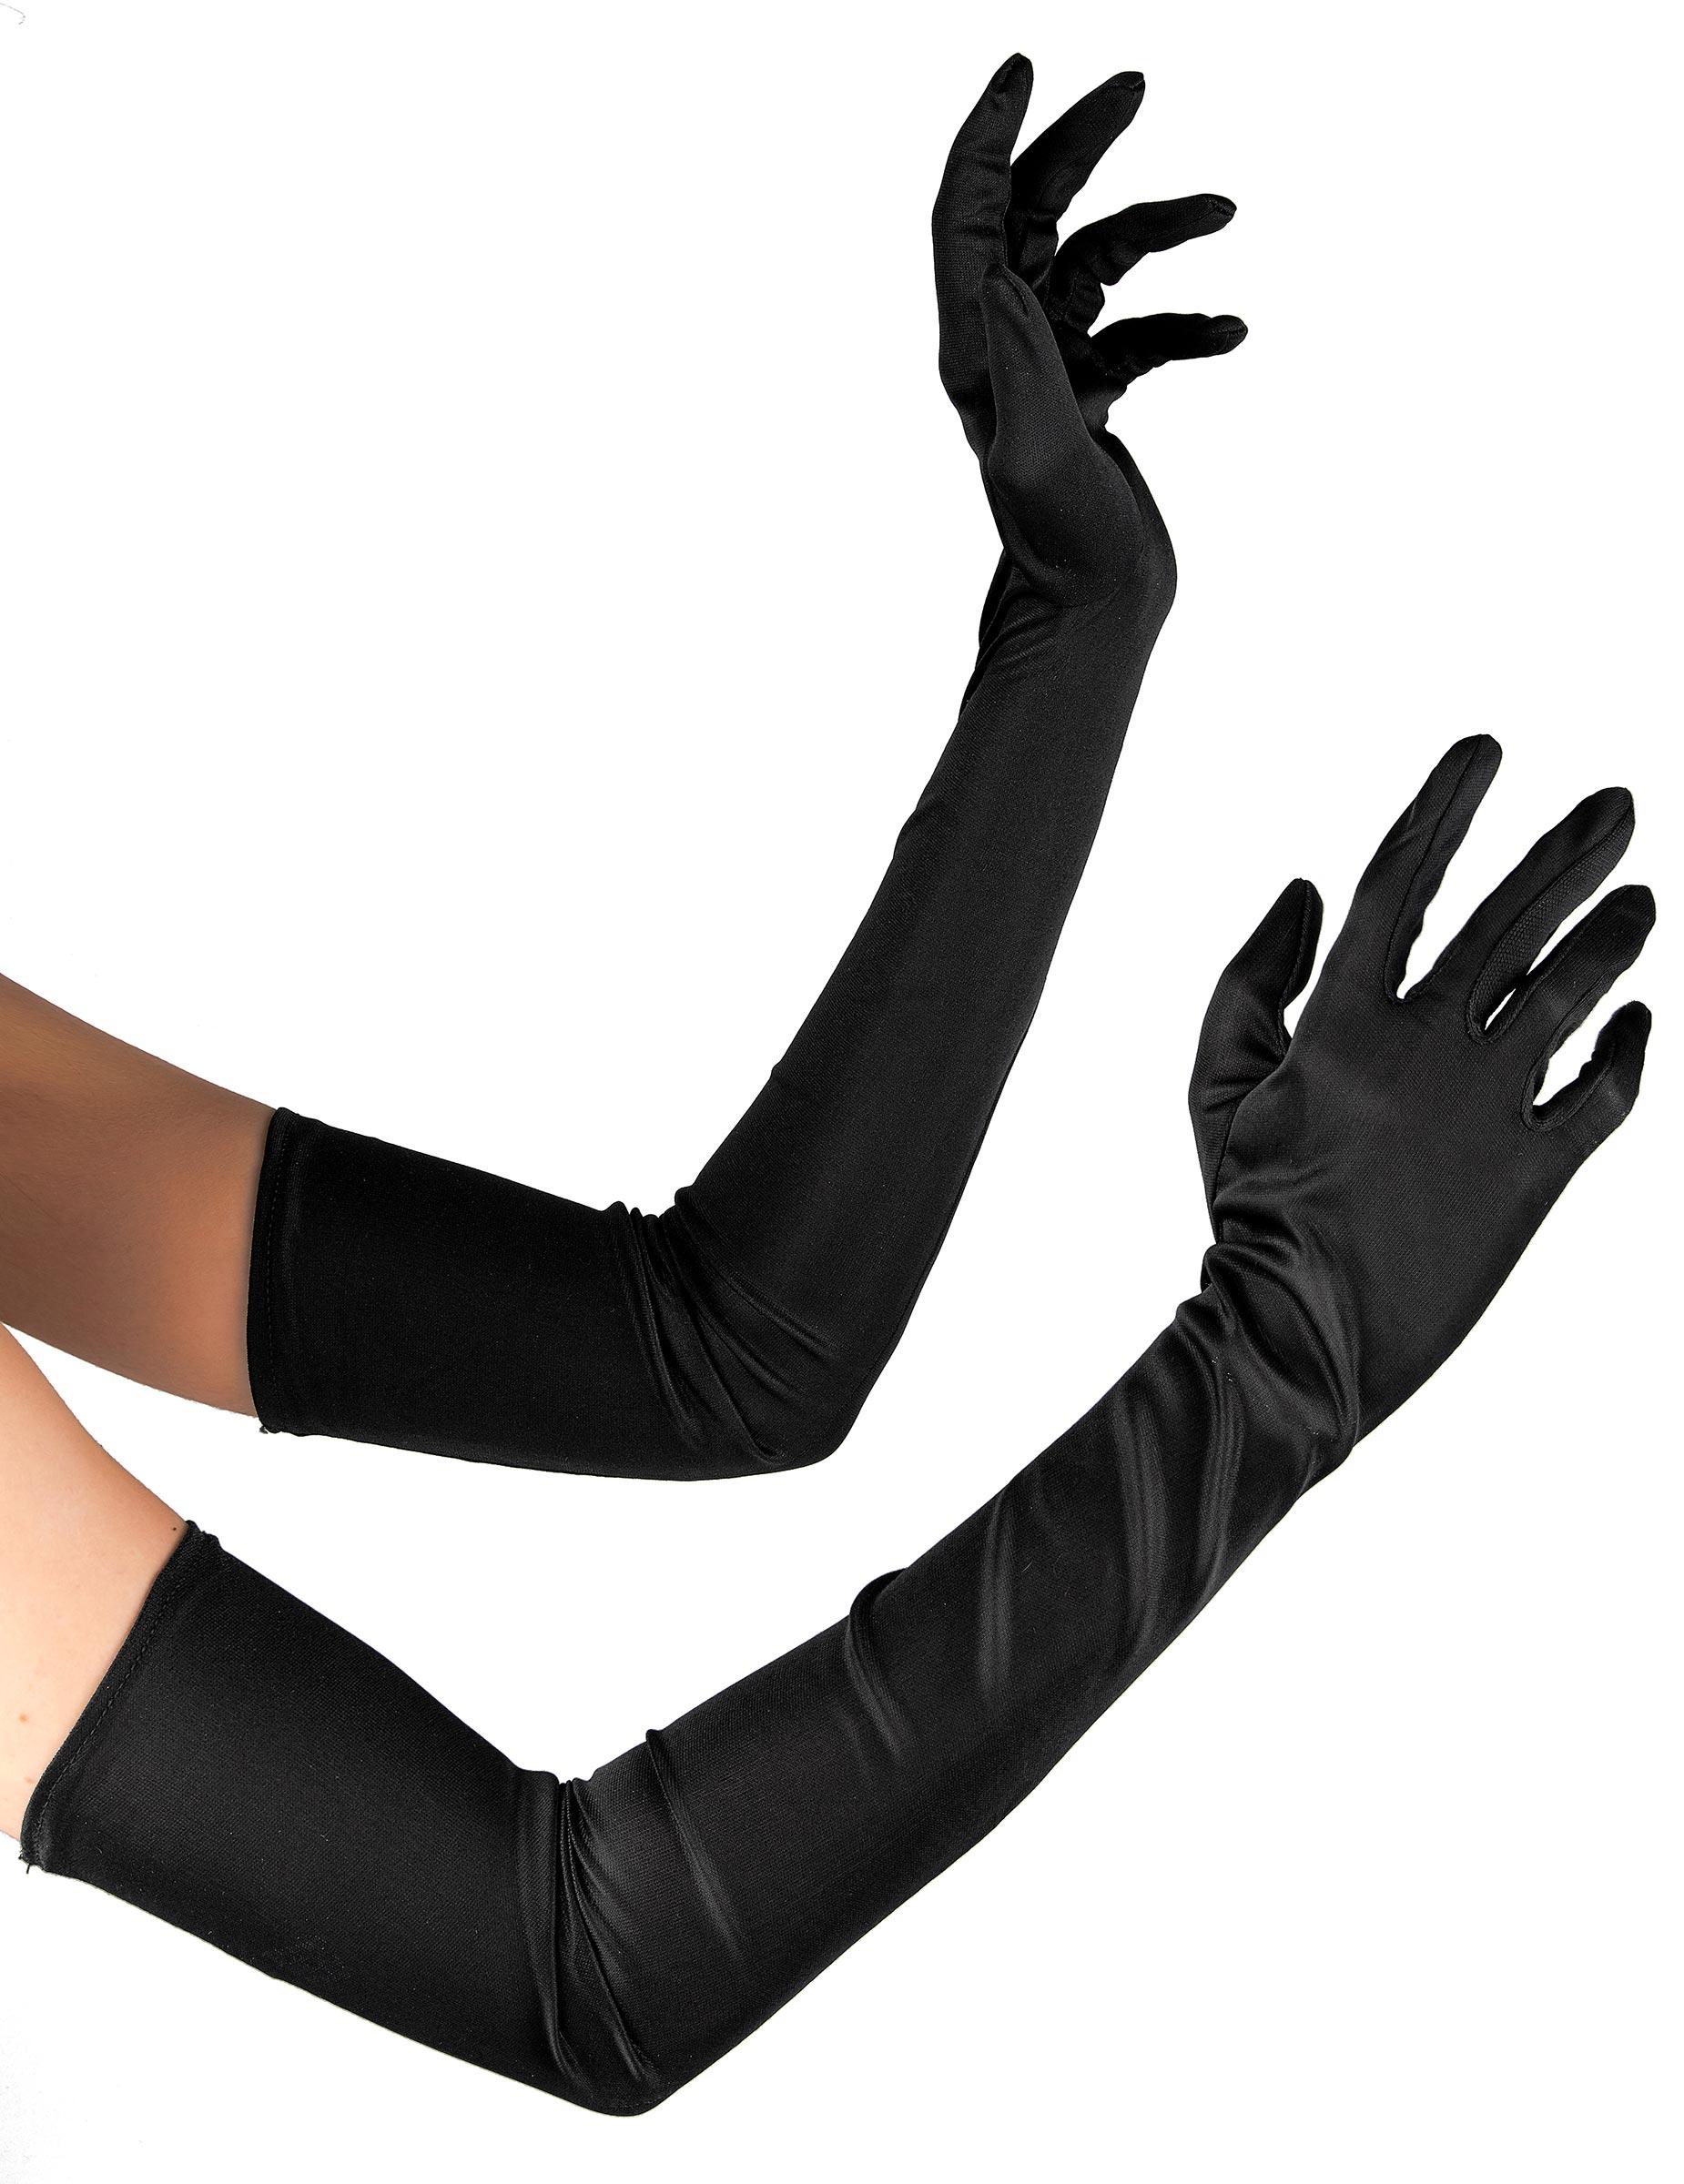 05e655e797585d Lange schwarze Handschuhe  Accessoires